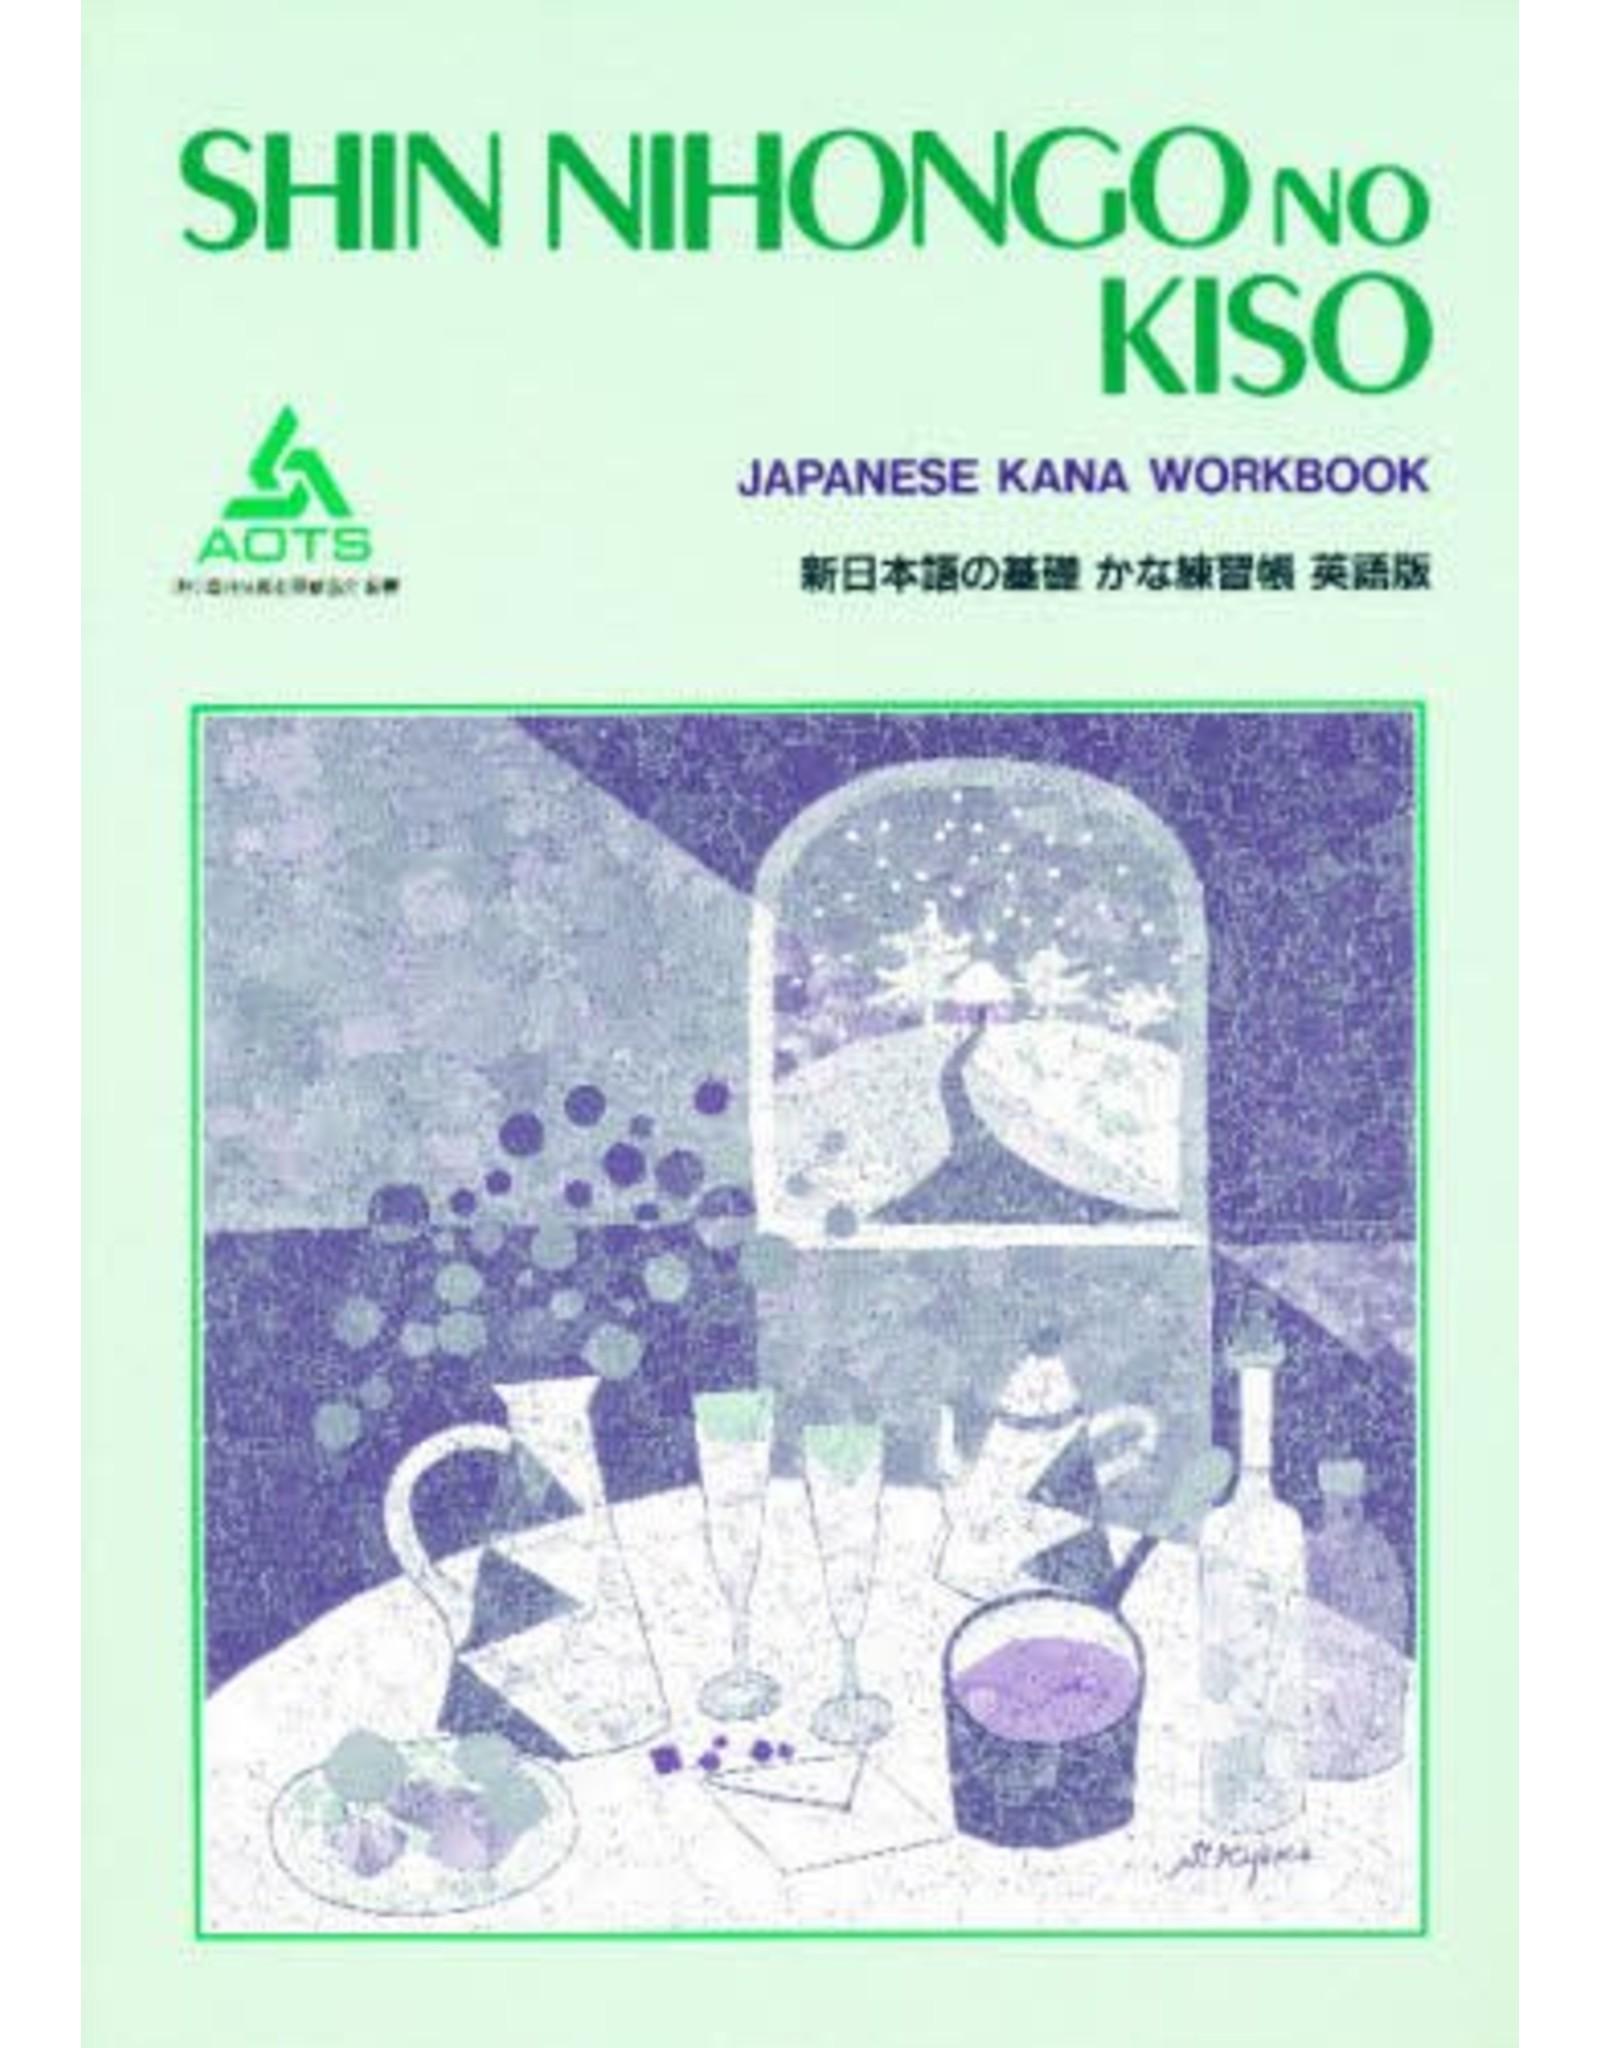 3A Corporation NEW NIHONGO NO KISO JAPANESE KANA WORKBOOK